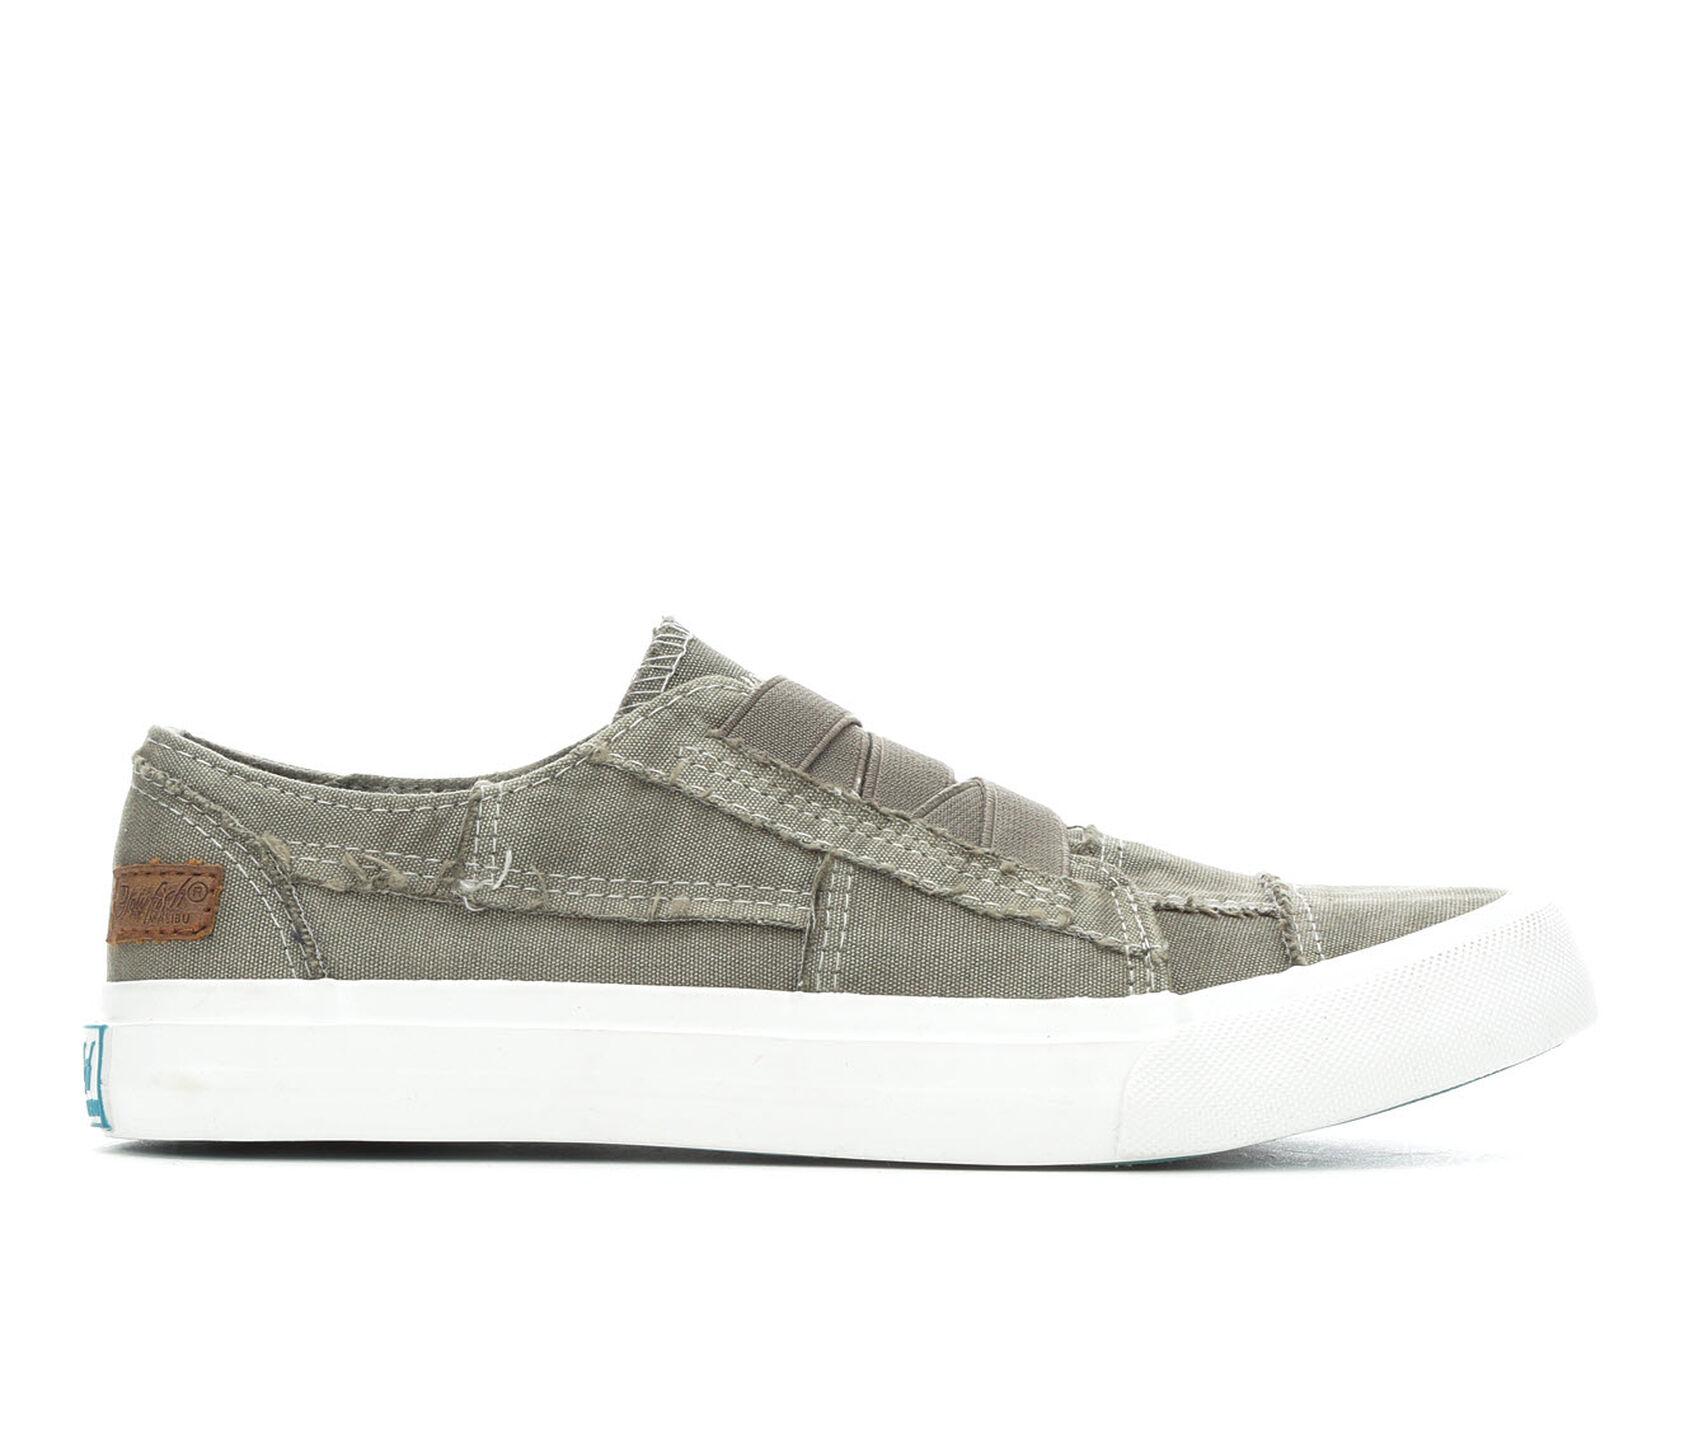 e2dd2054ca635 Women's Blowfish Malibu Marley Sneakers